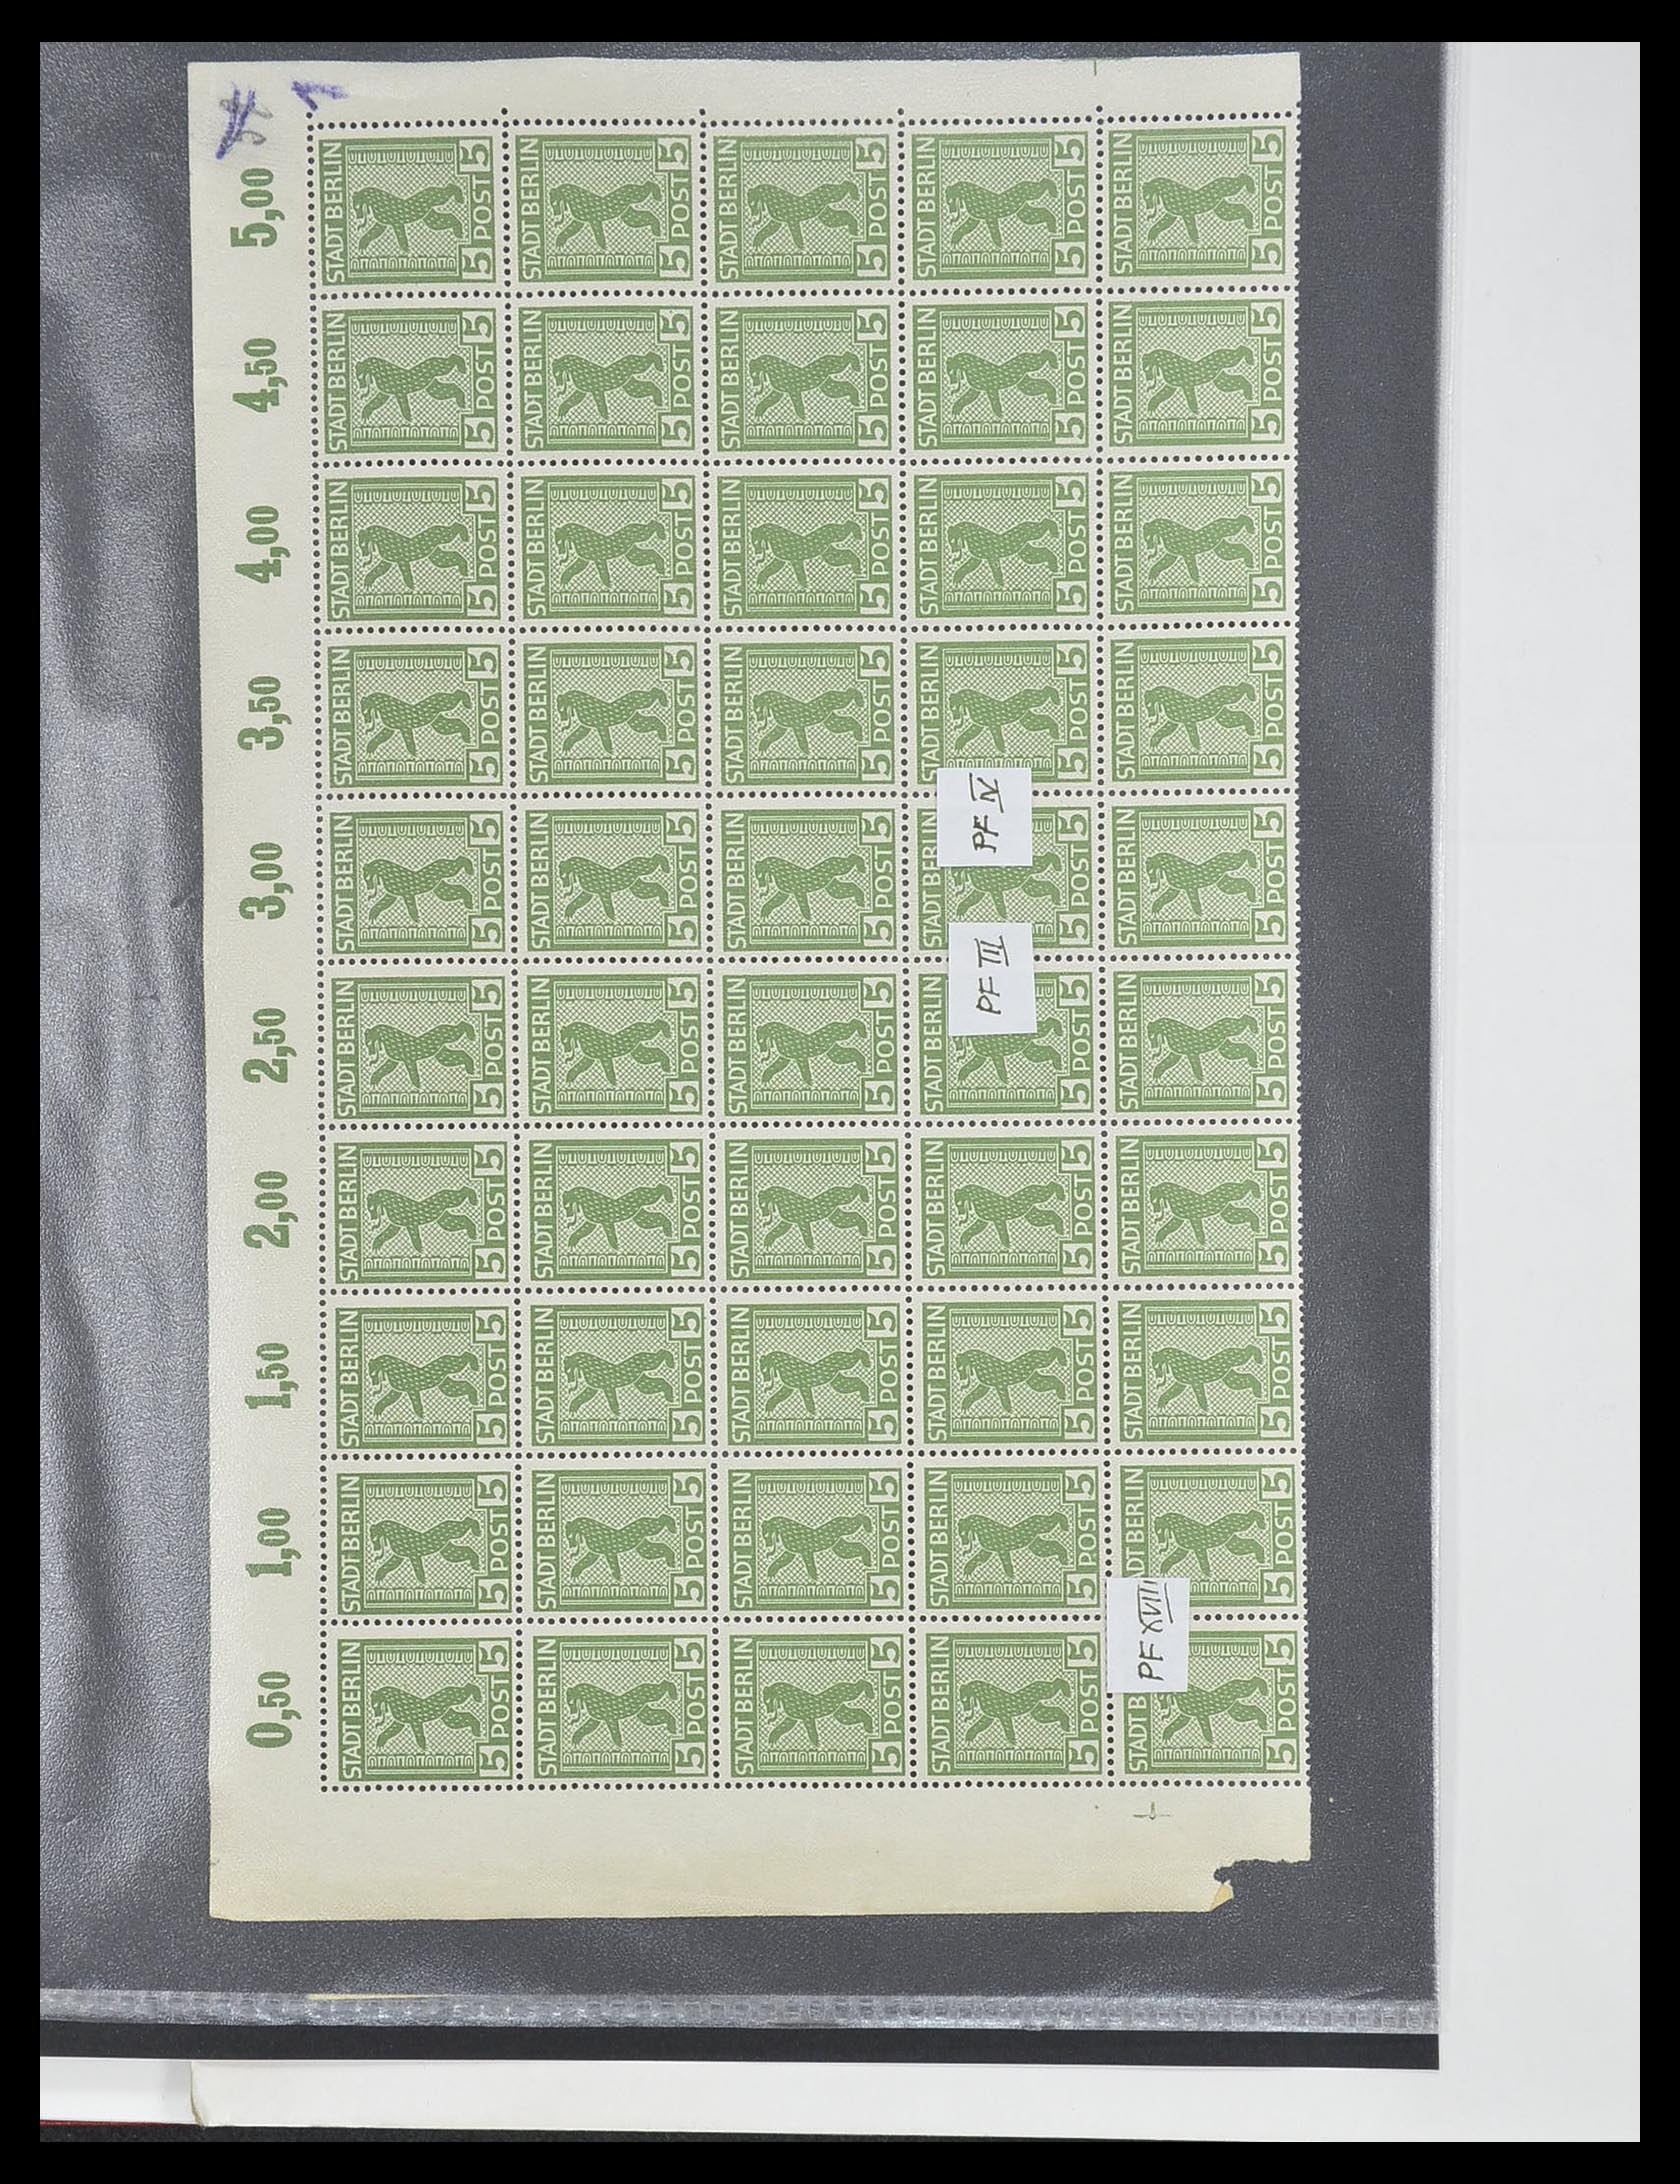 33698 003 - Postzegelverzameling 33698 Sovjet Zone 1945-1948.